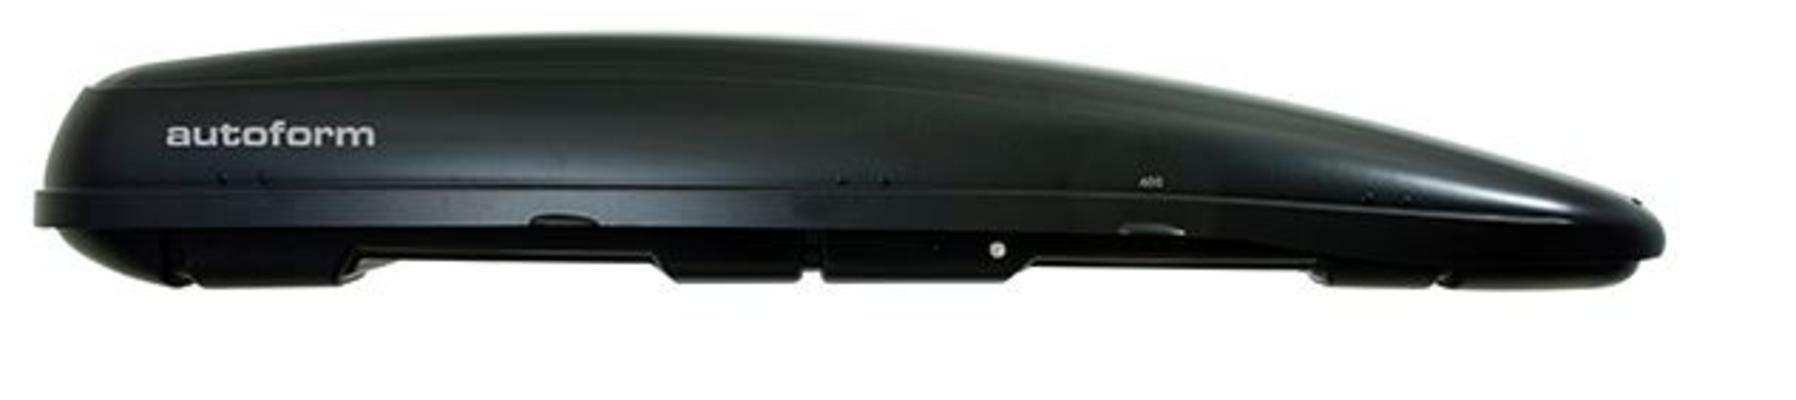 Suksiboksi XR600, Autoform - Suksiboksi, mattamusta